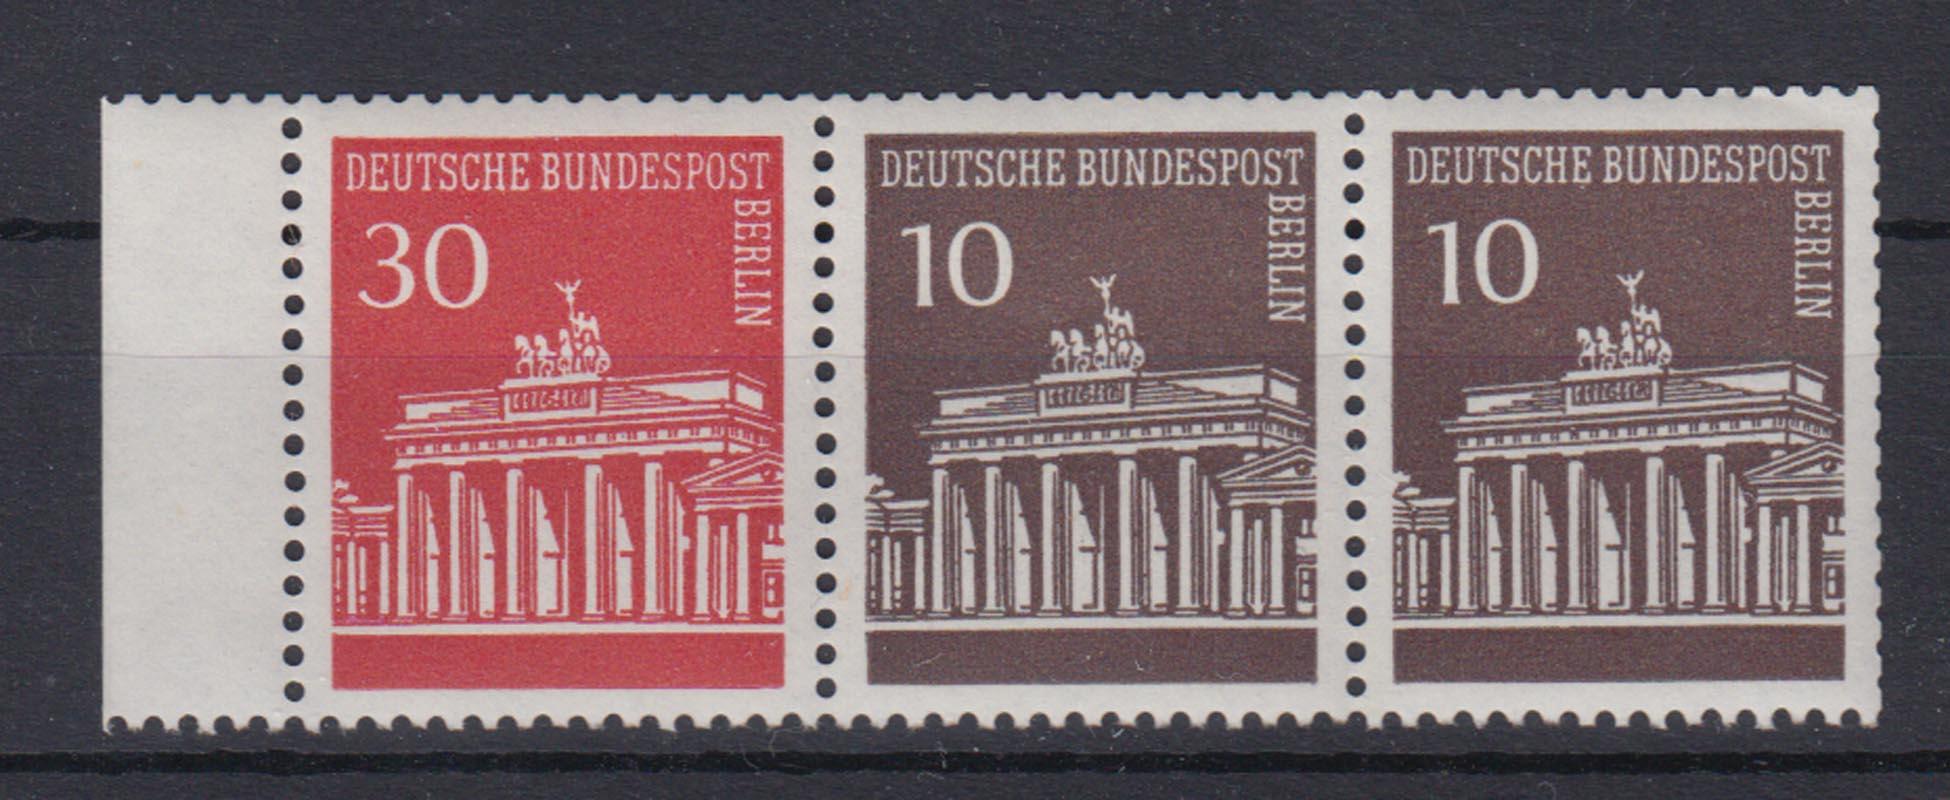 Motive Berlin Postfrisch 1949 Minr 42-60 Berliner Bauten